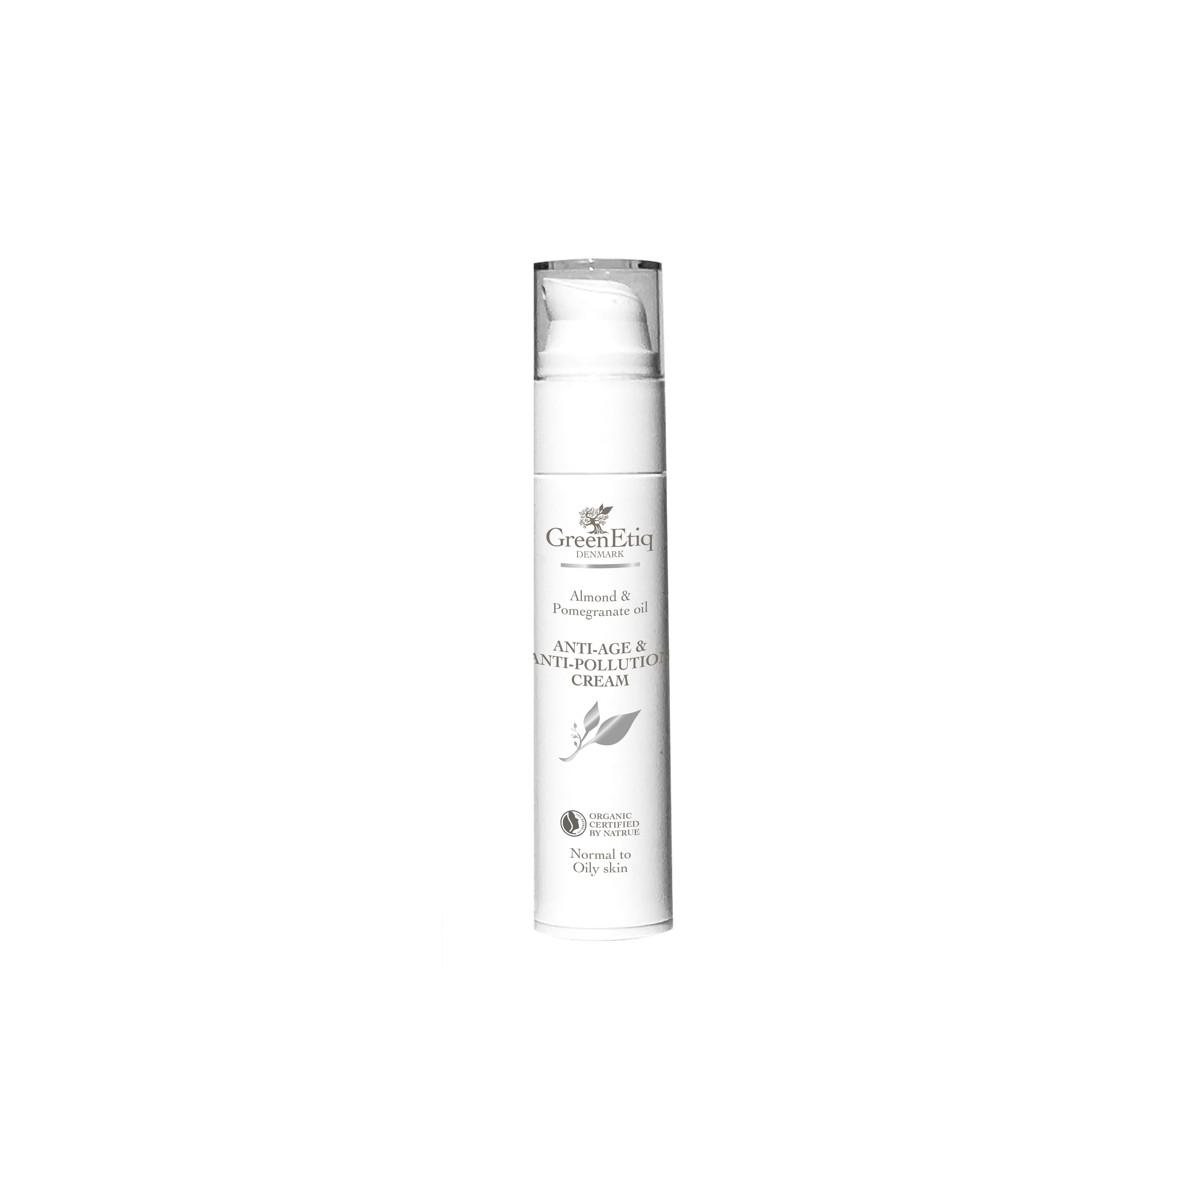 GreenEtiq Anti Pollution Cream